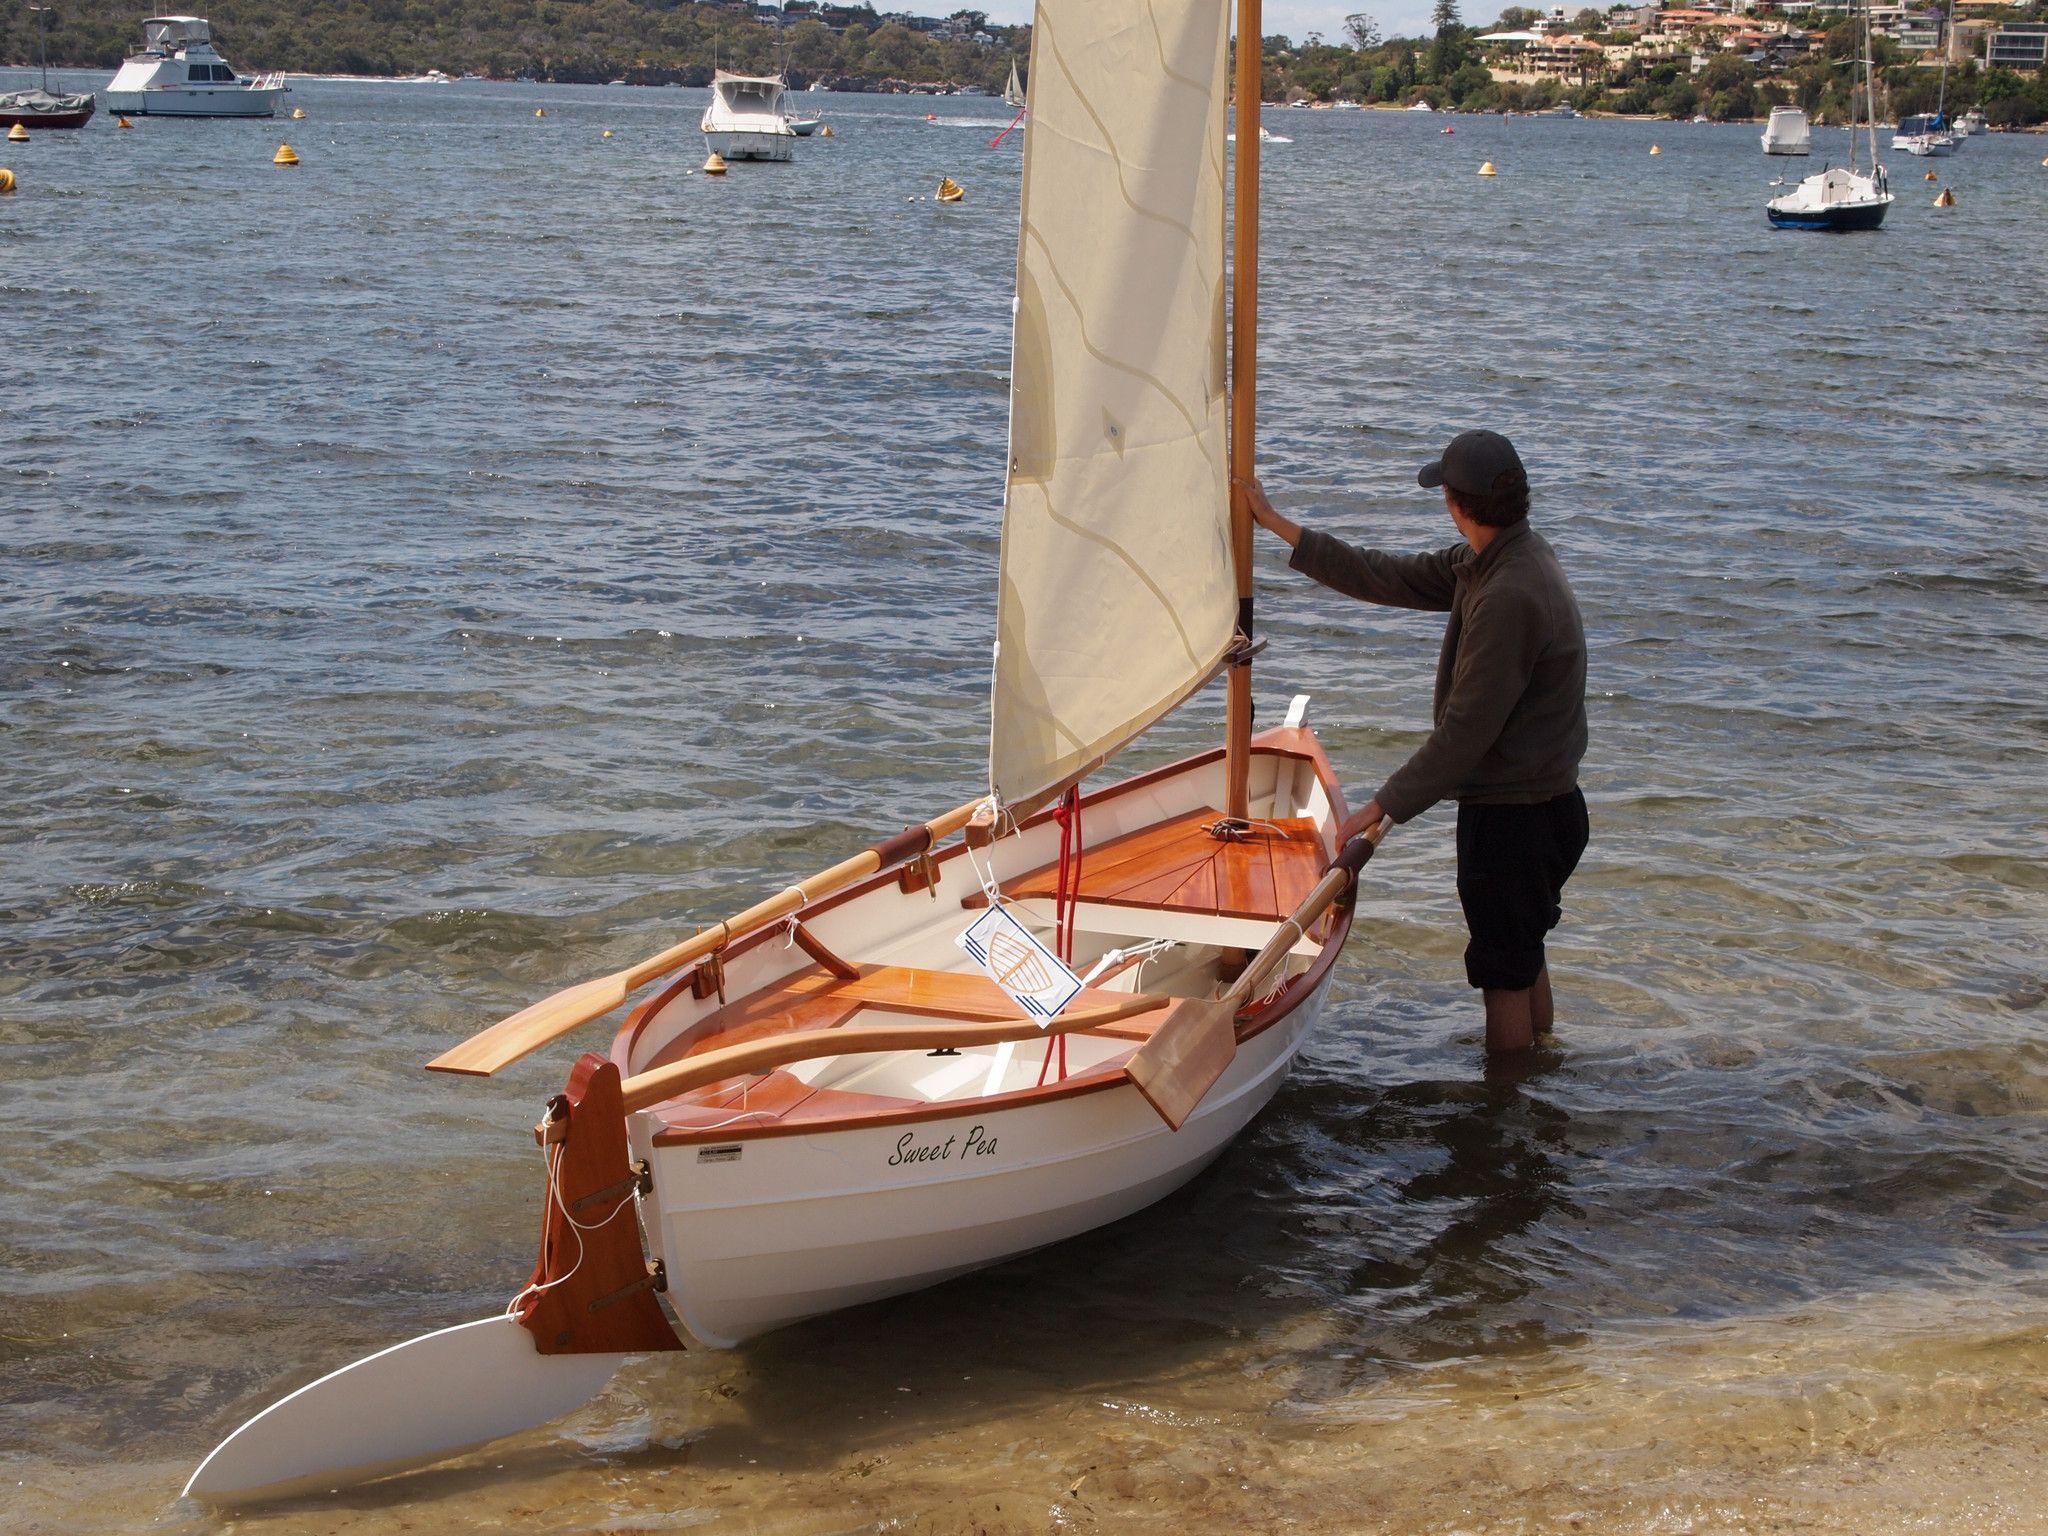 12' Maine PeaPod Boat   Boating, Wooden boats and Small sailboats